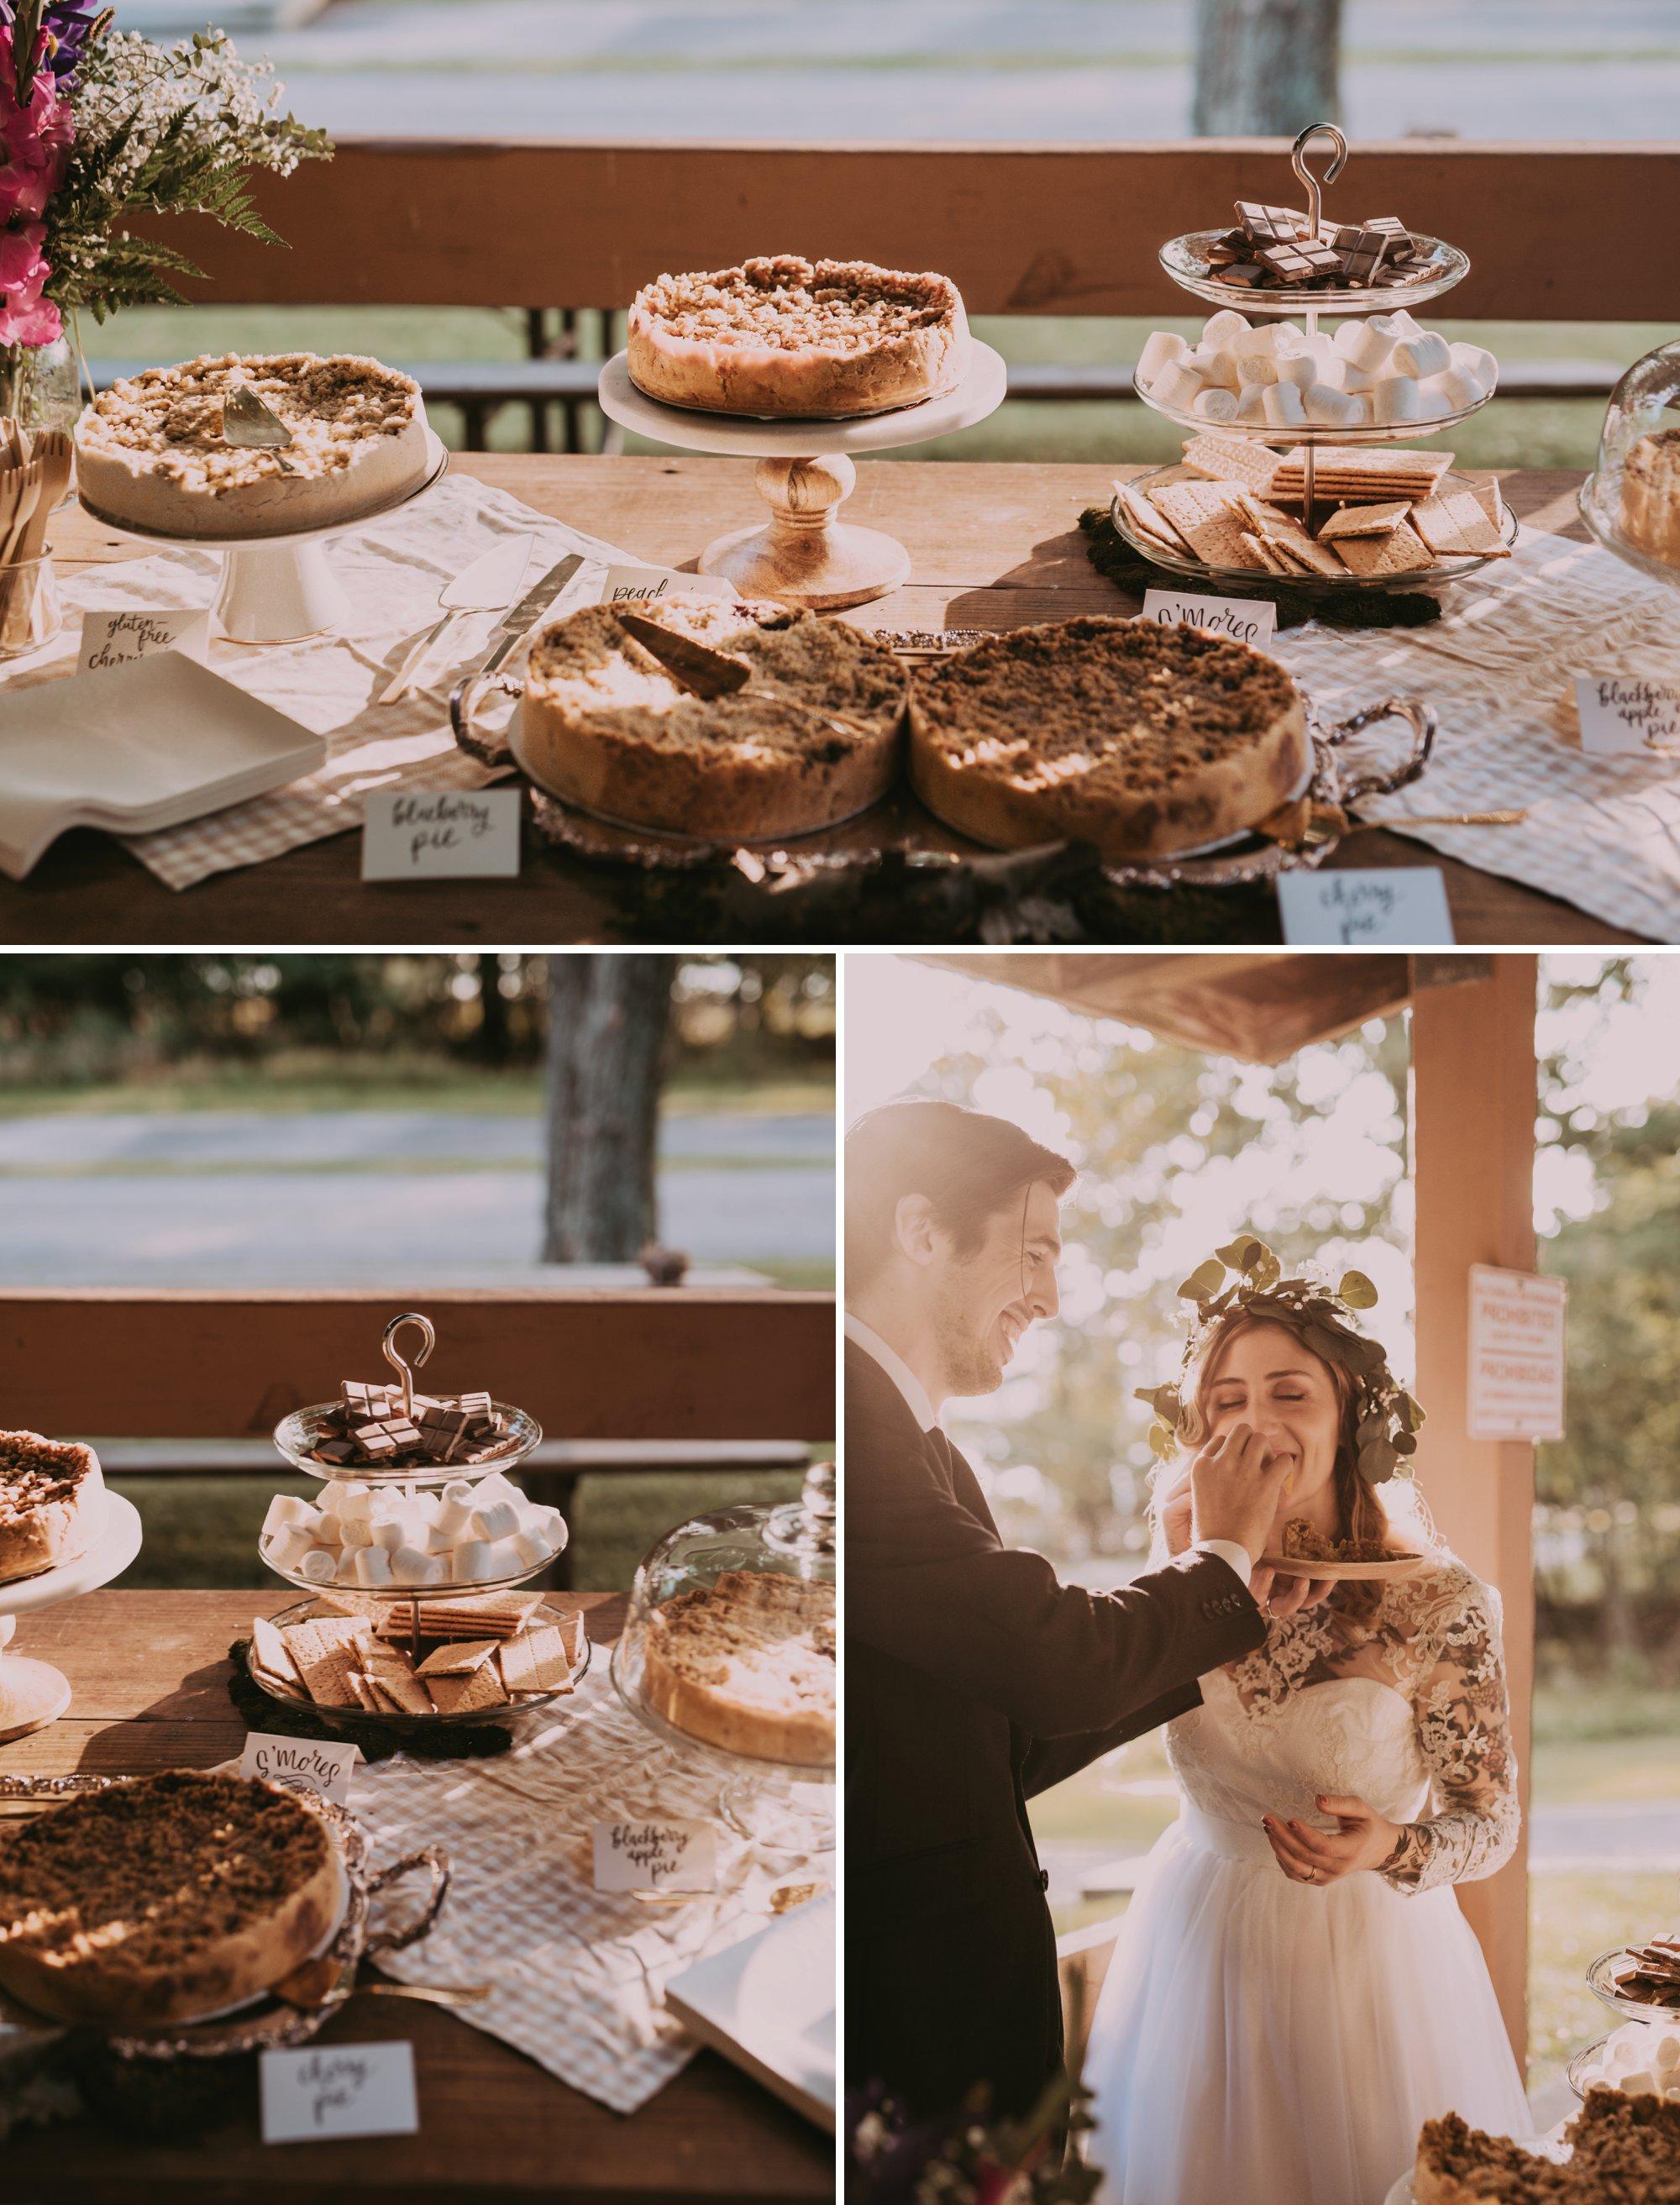 Rustic Intimate Vegan Forest Wedding with Handmade Dress. Vegan Desserts